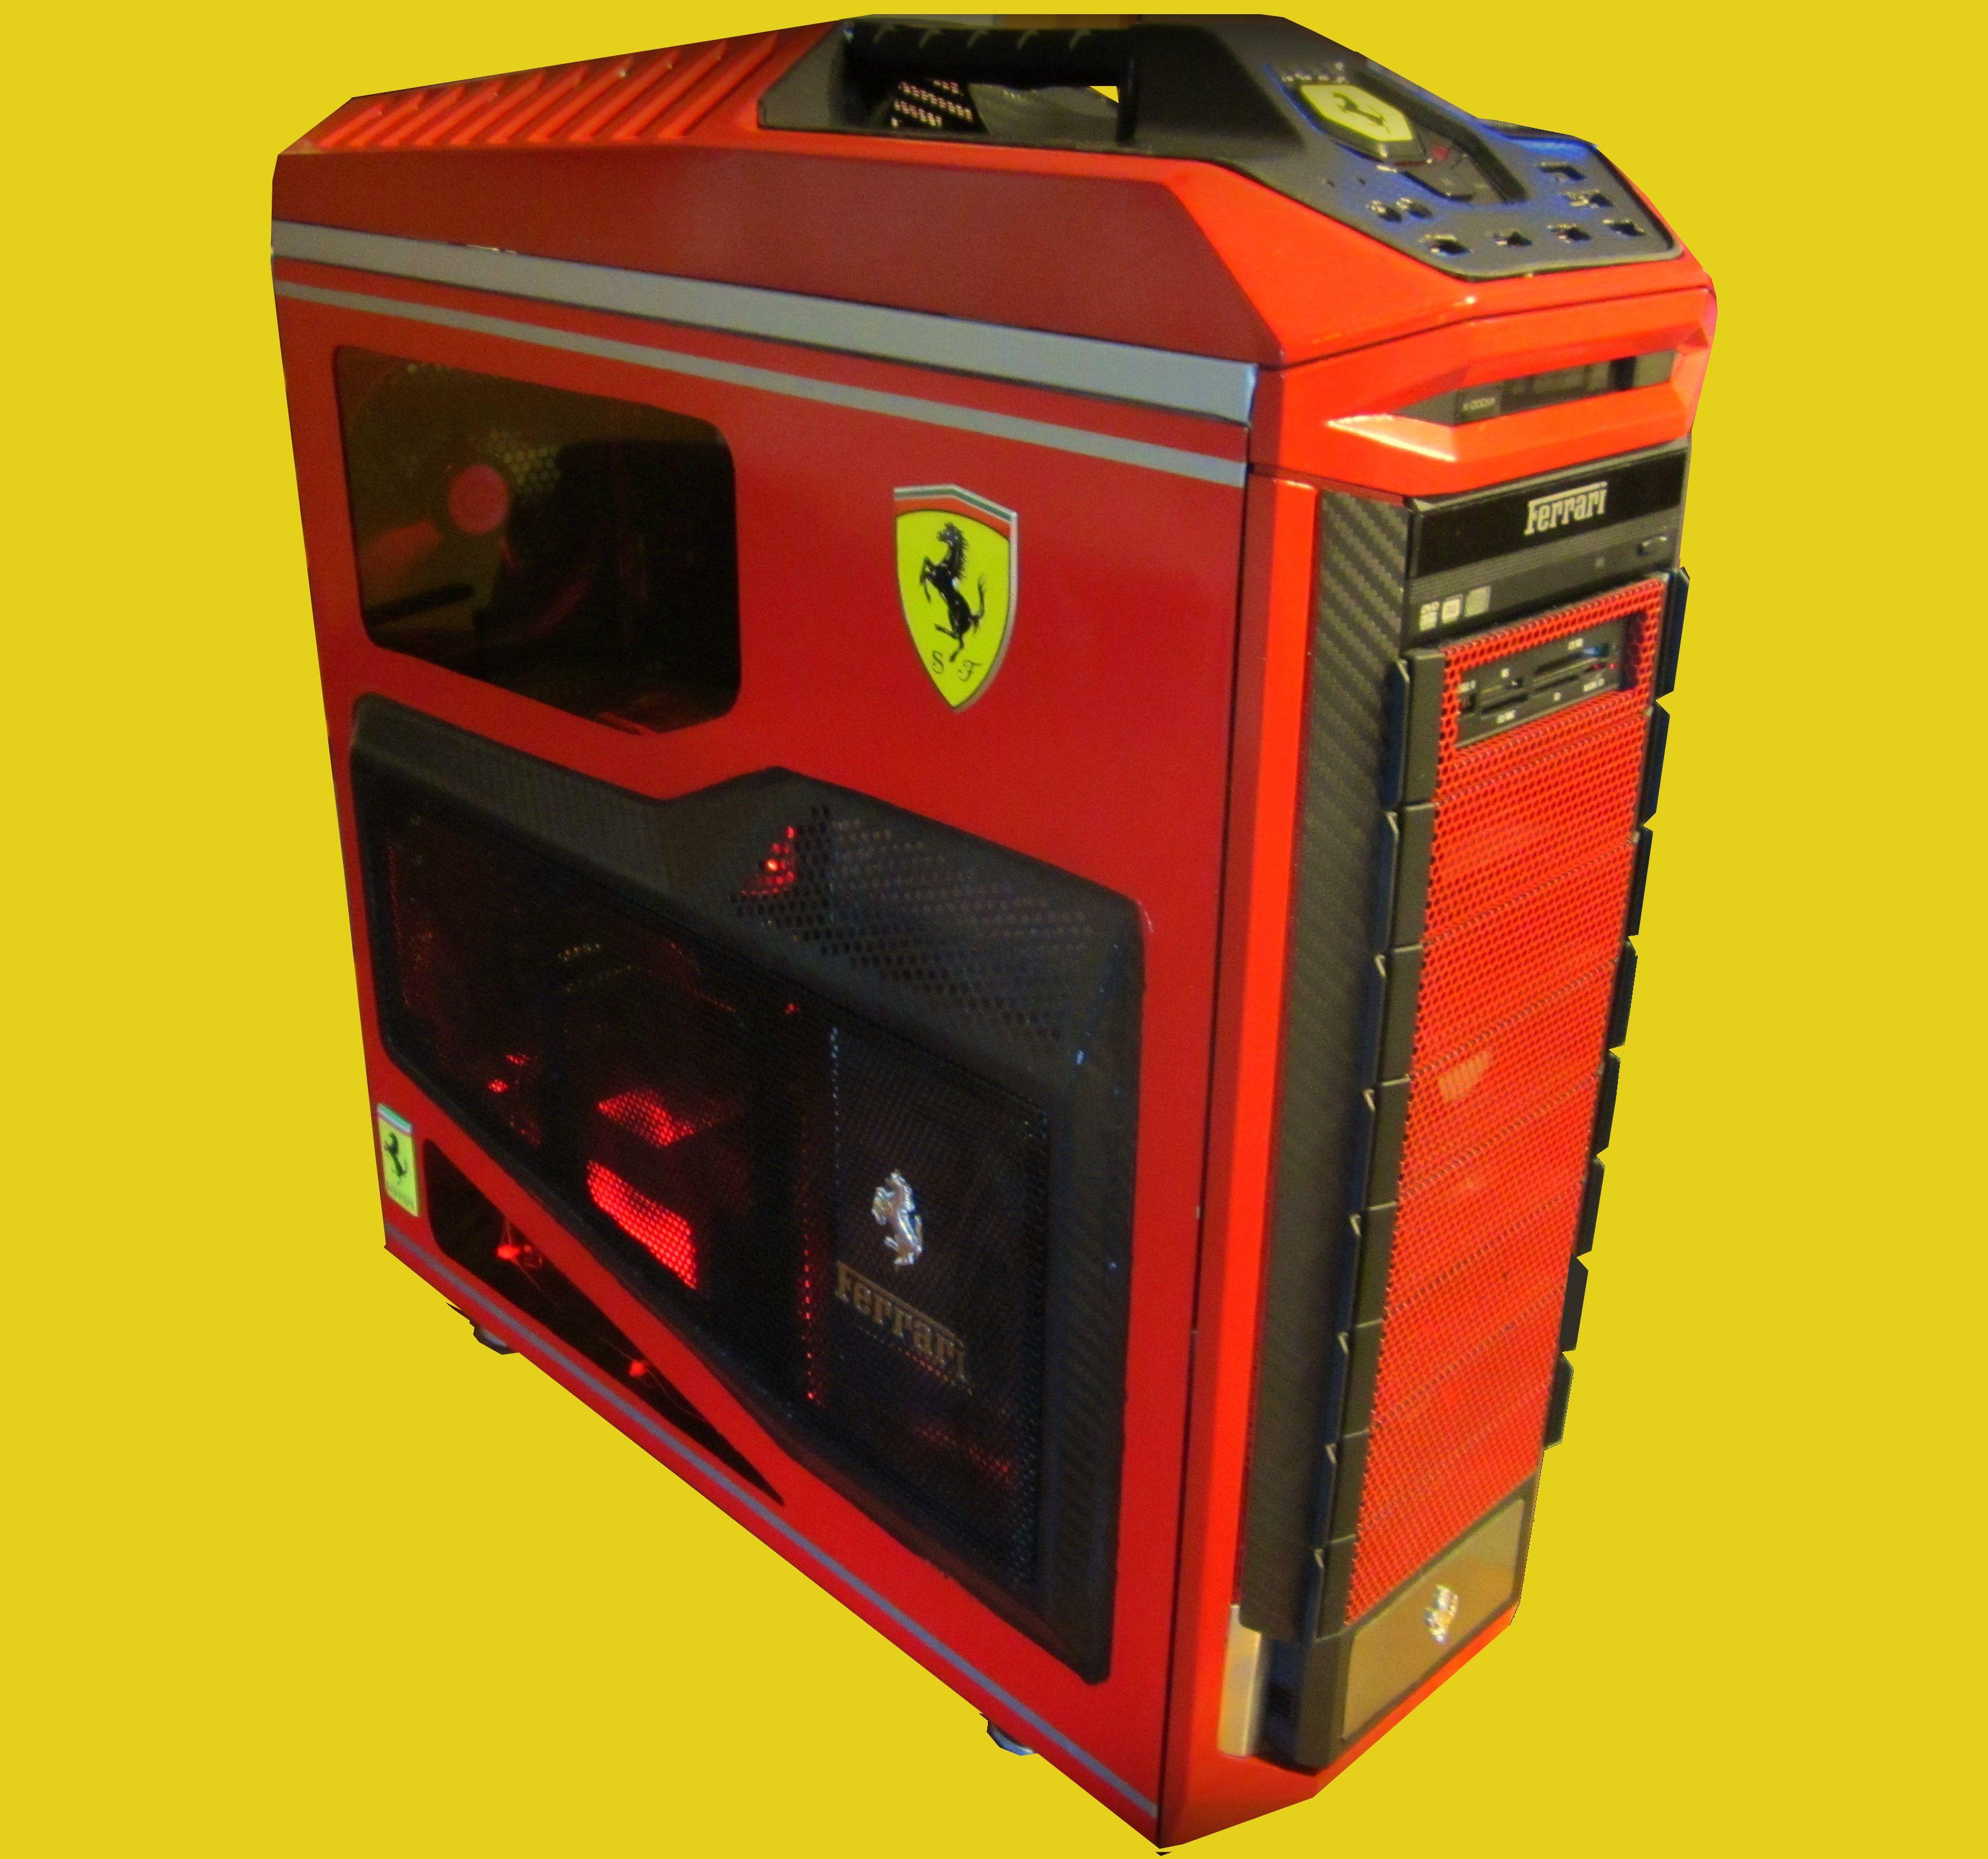 Enigma Ferrari 599 Tribute Build By Derek Smith Ferrari 599 Hot Rodder Gaming Pc Build